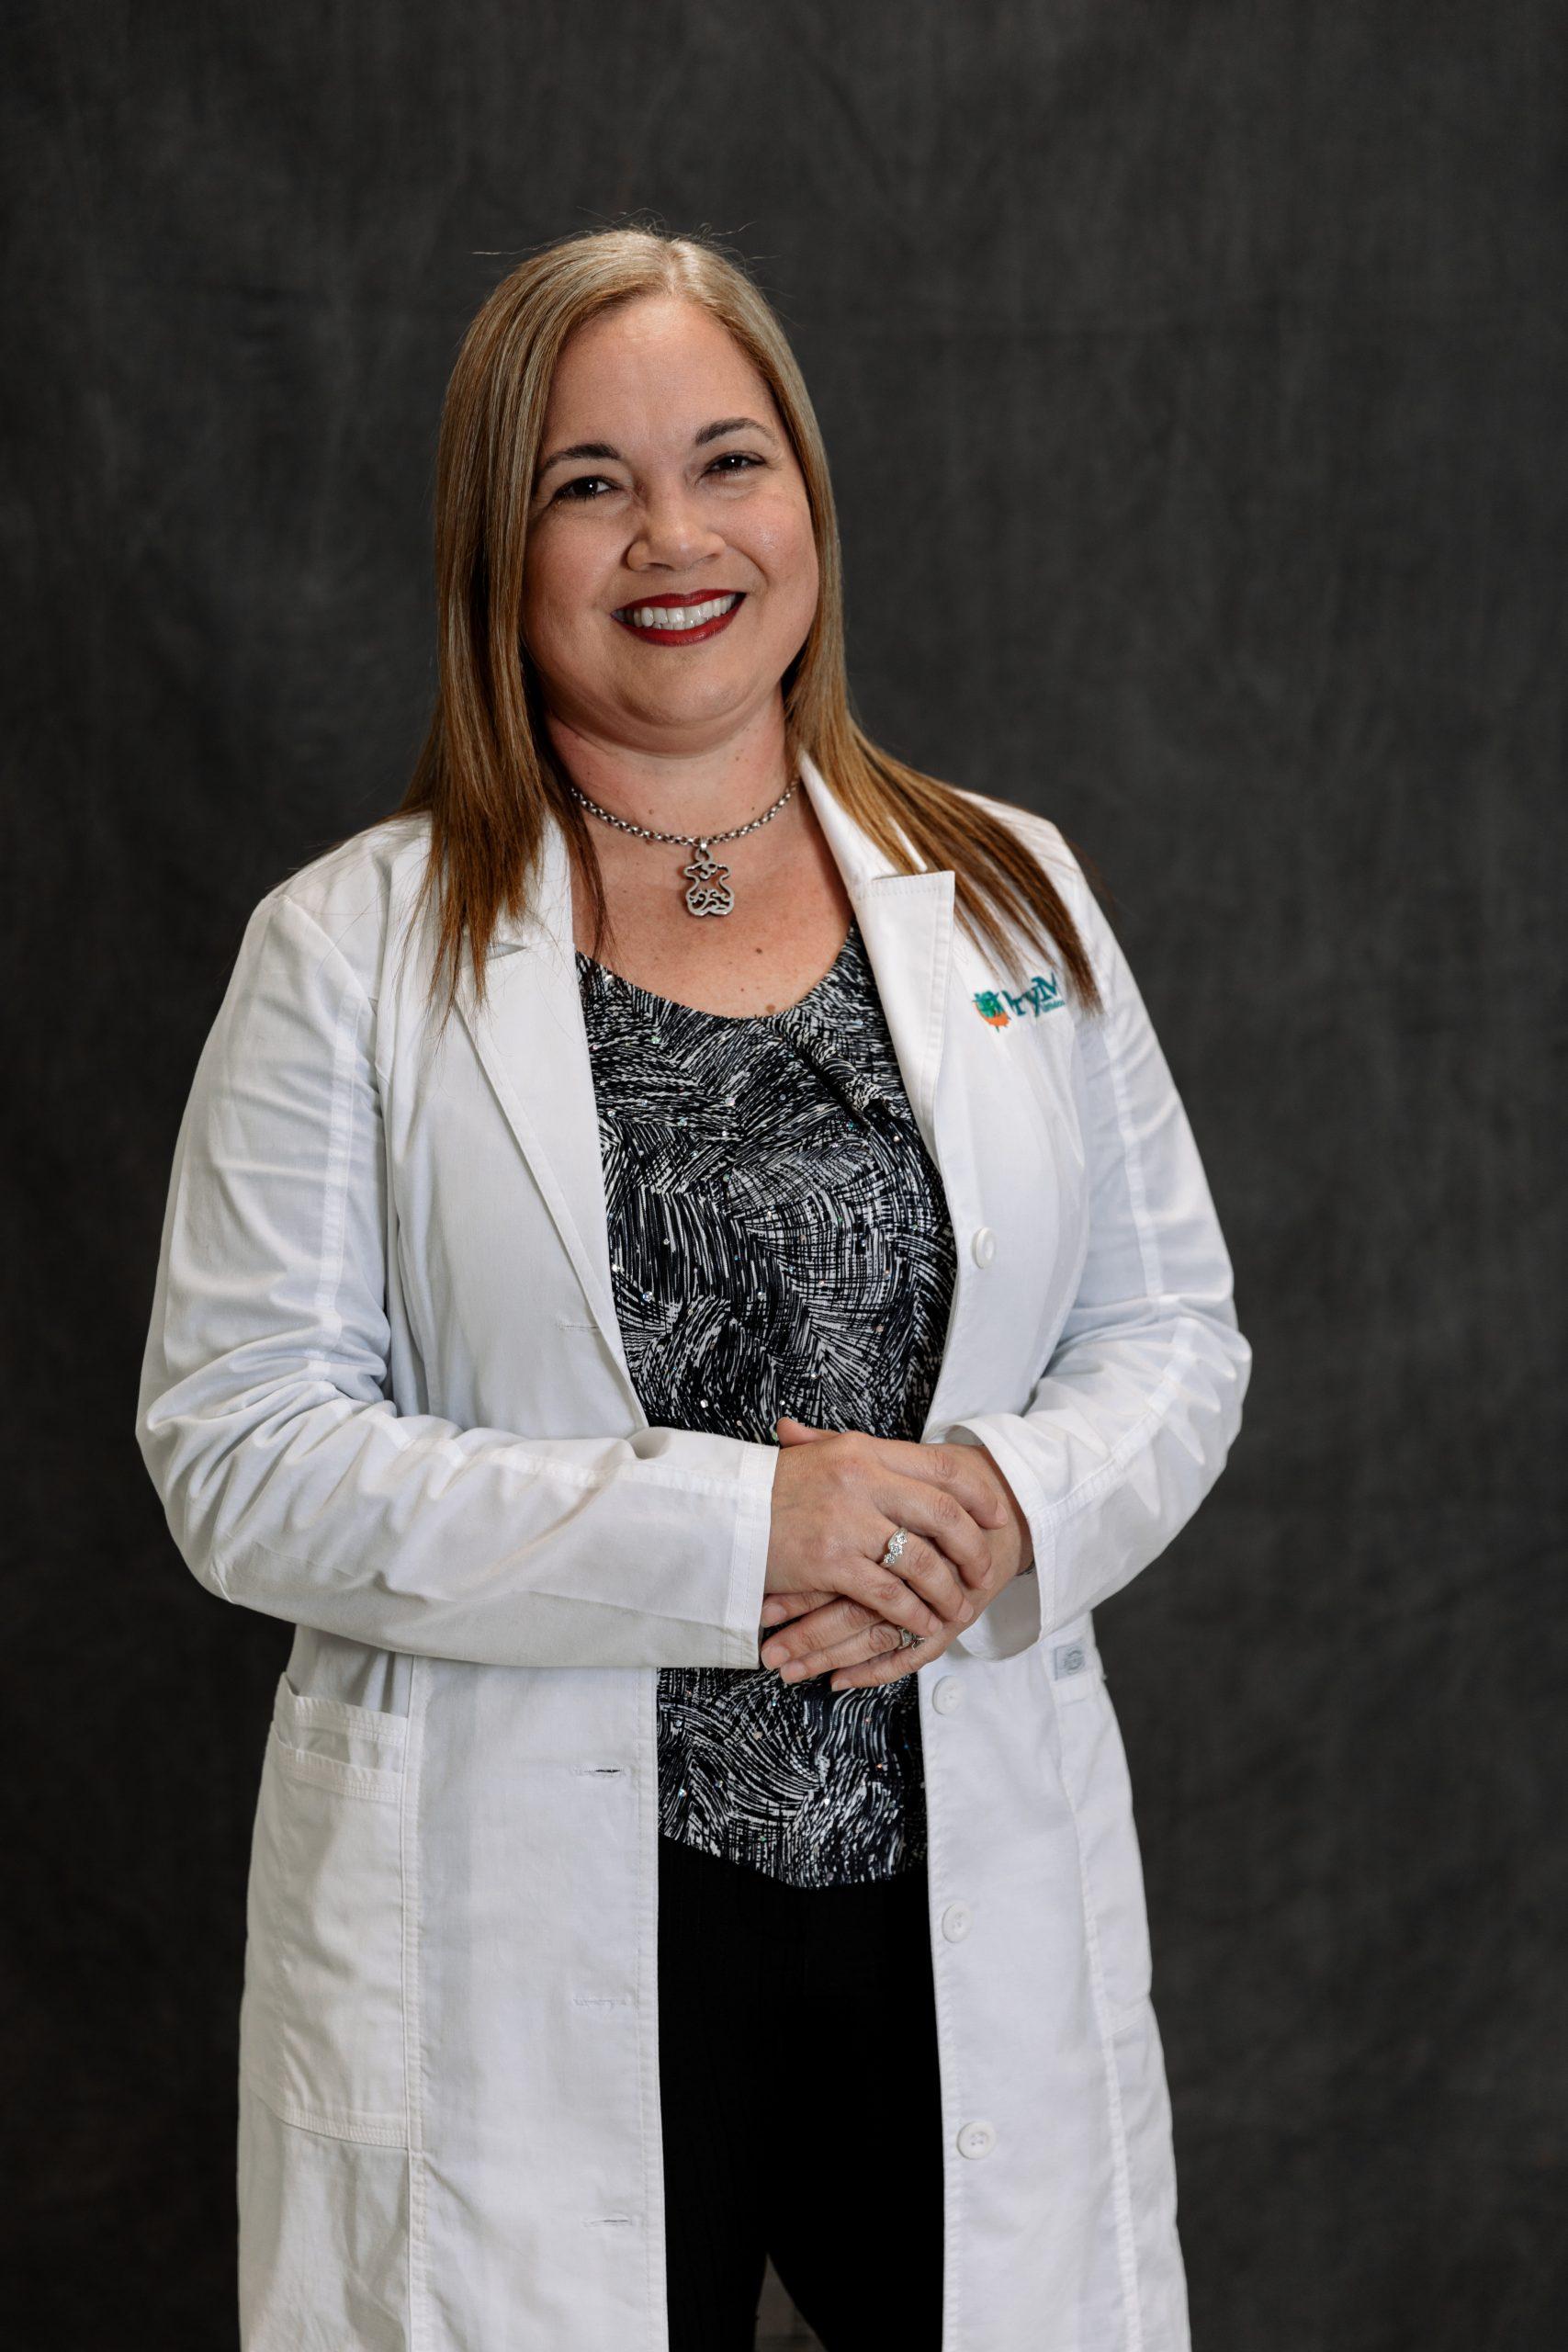 Dra. Kennice Lopez